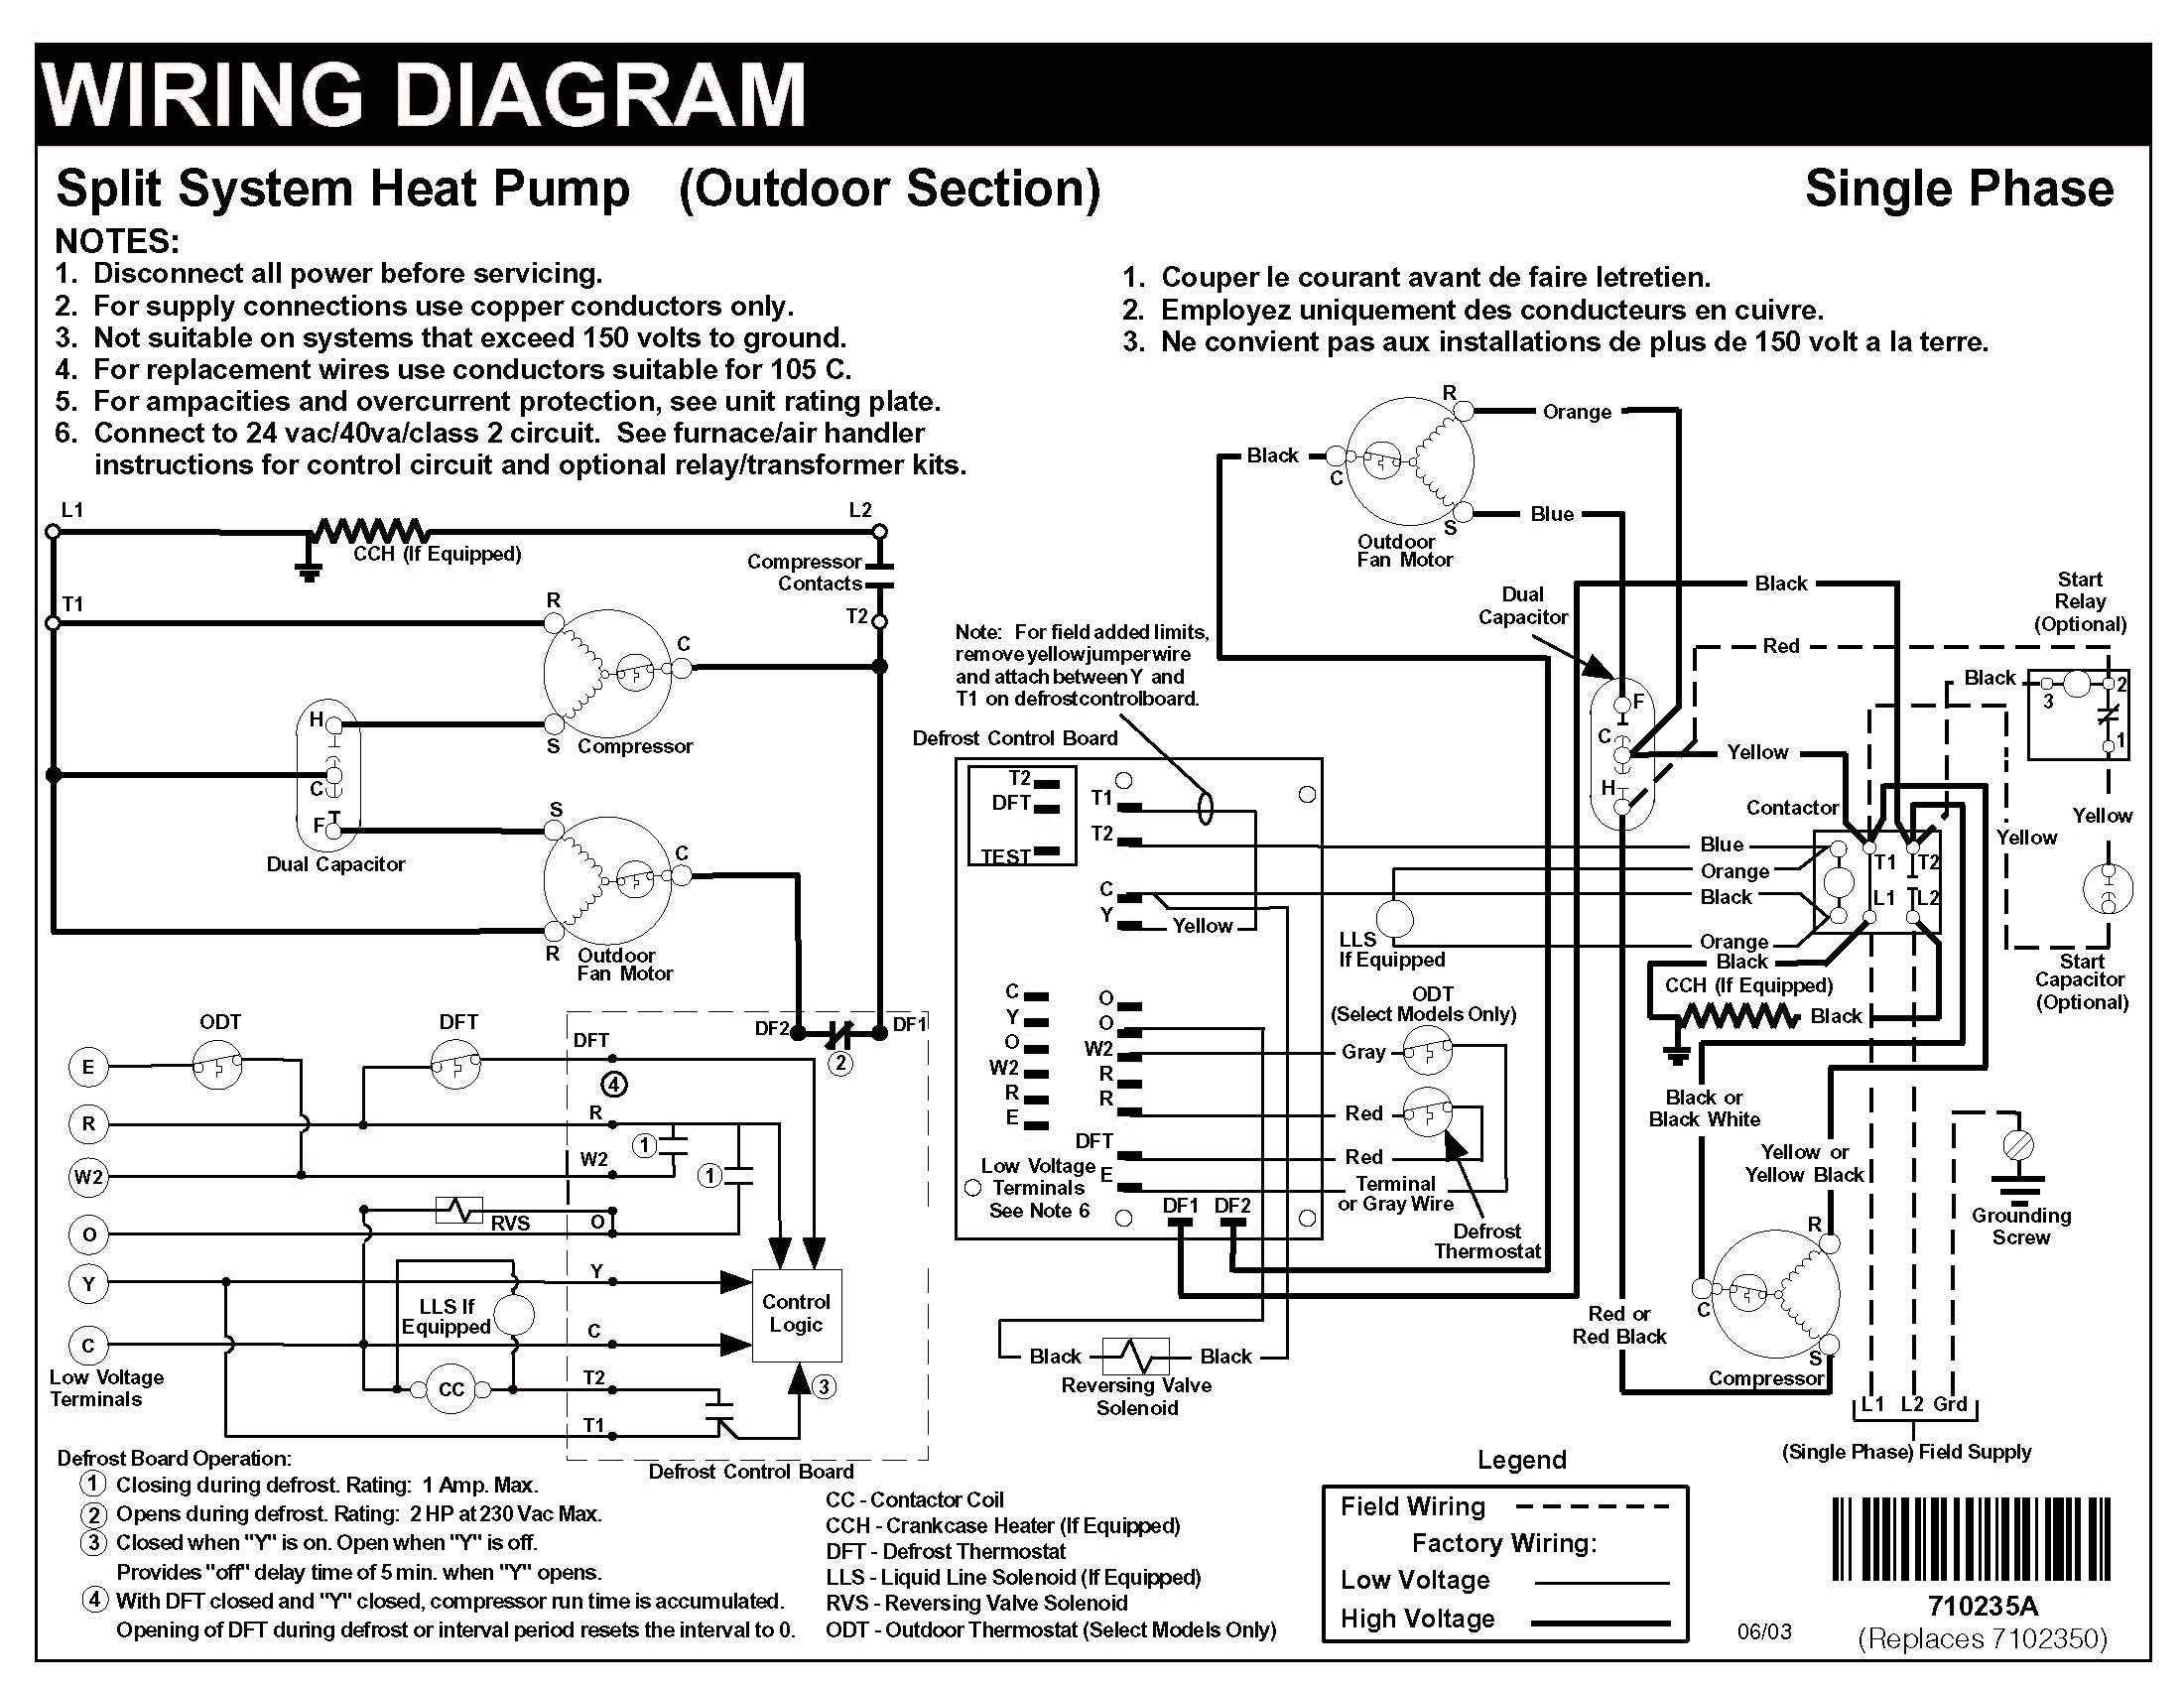 Nordyne Ac Wiring Diagram Fresh Heat Pump Air Conditioner nordyne Heat Pump thermostat Wiring